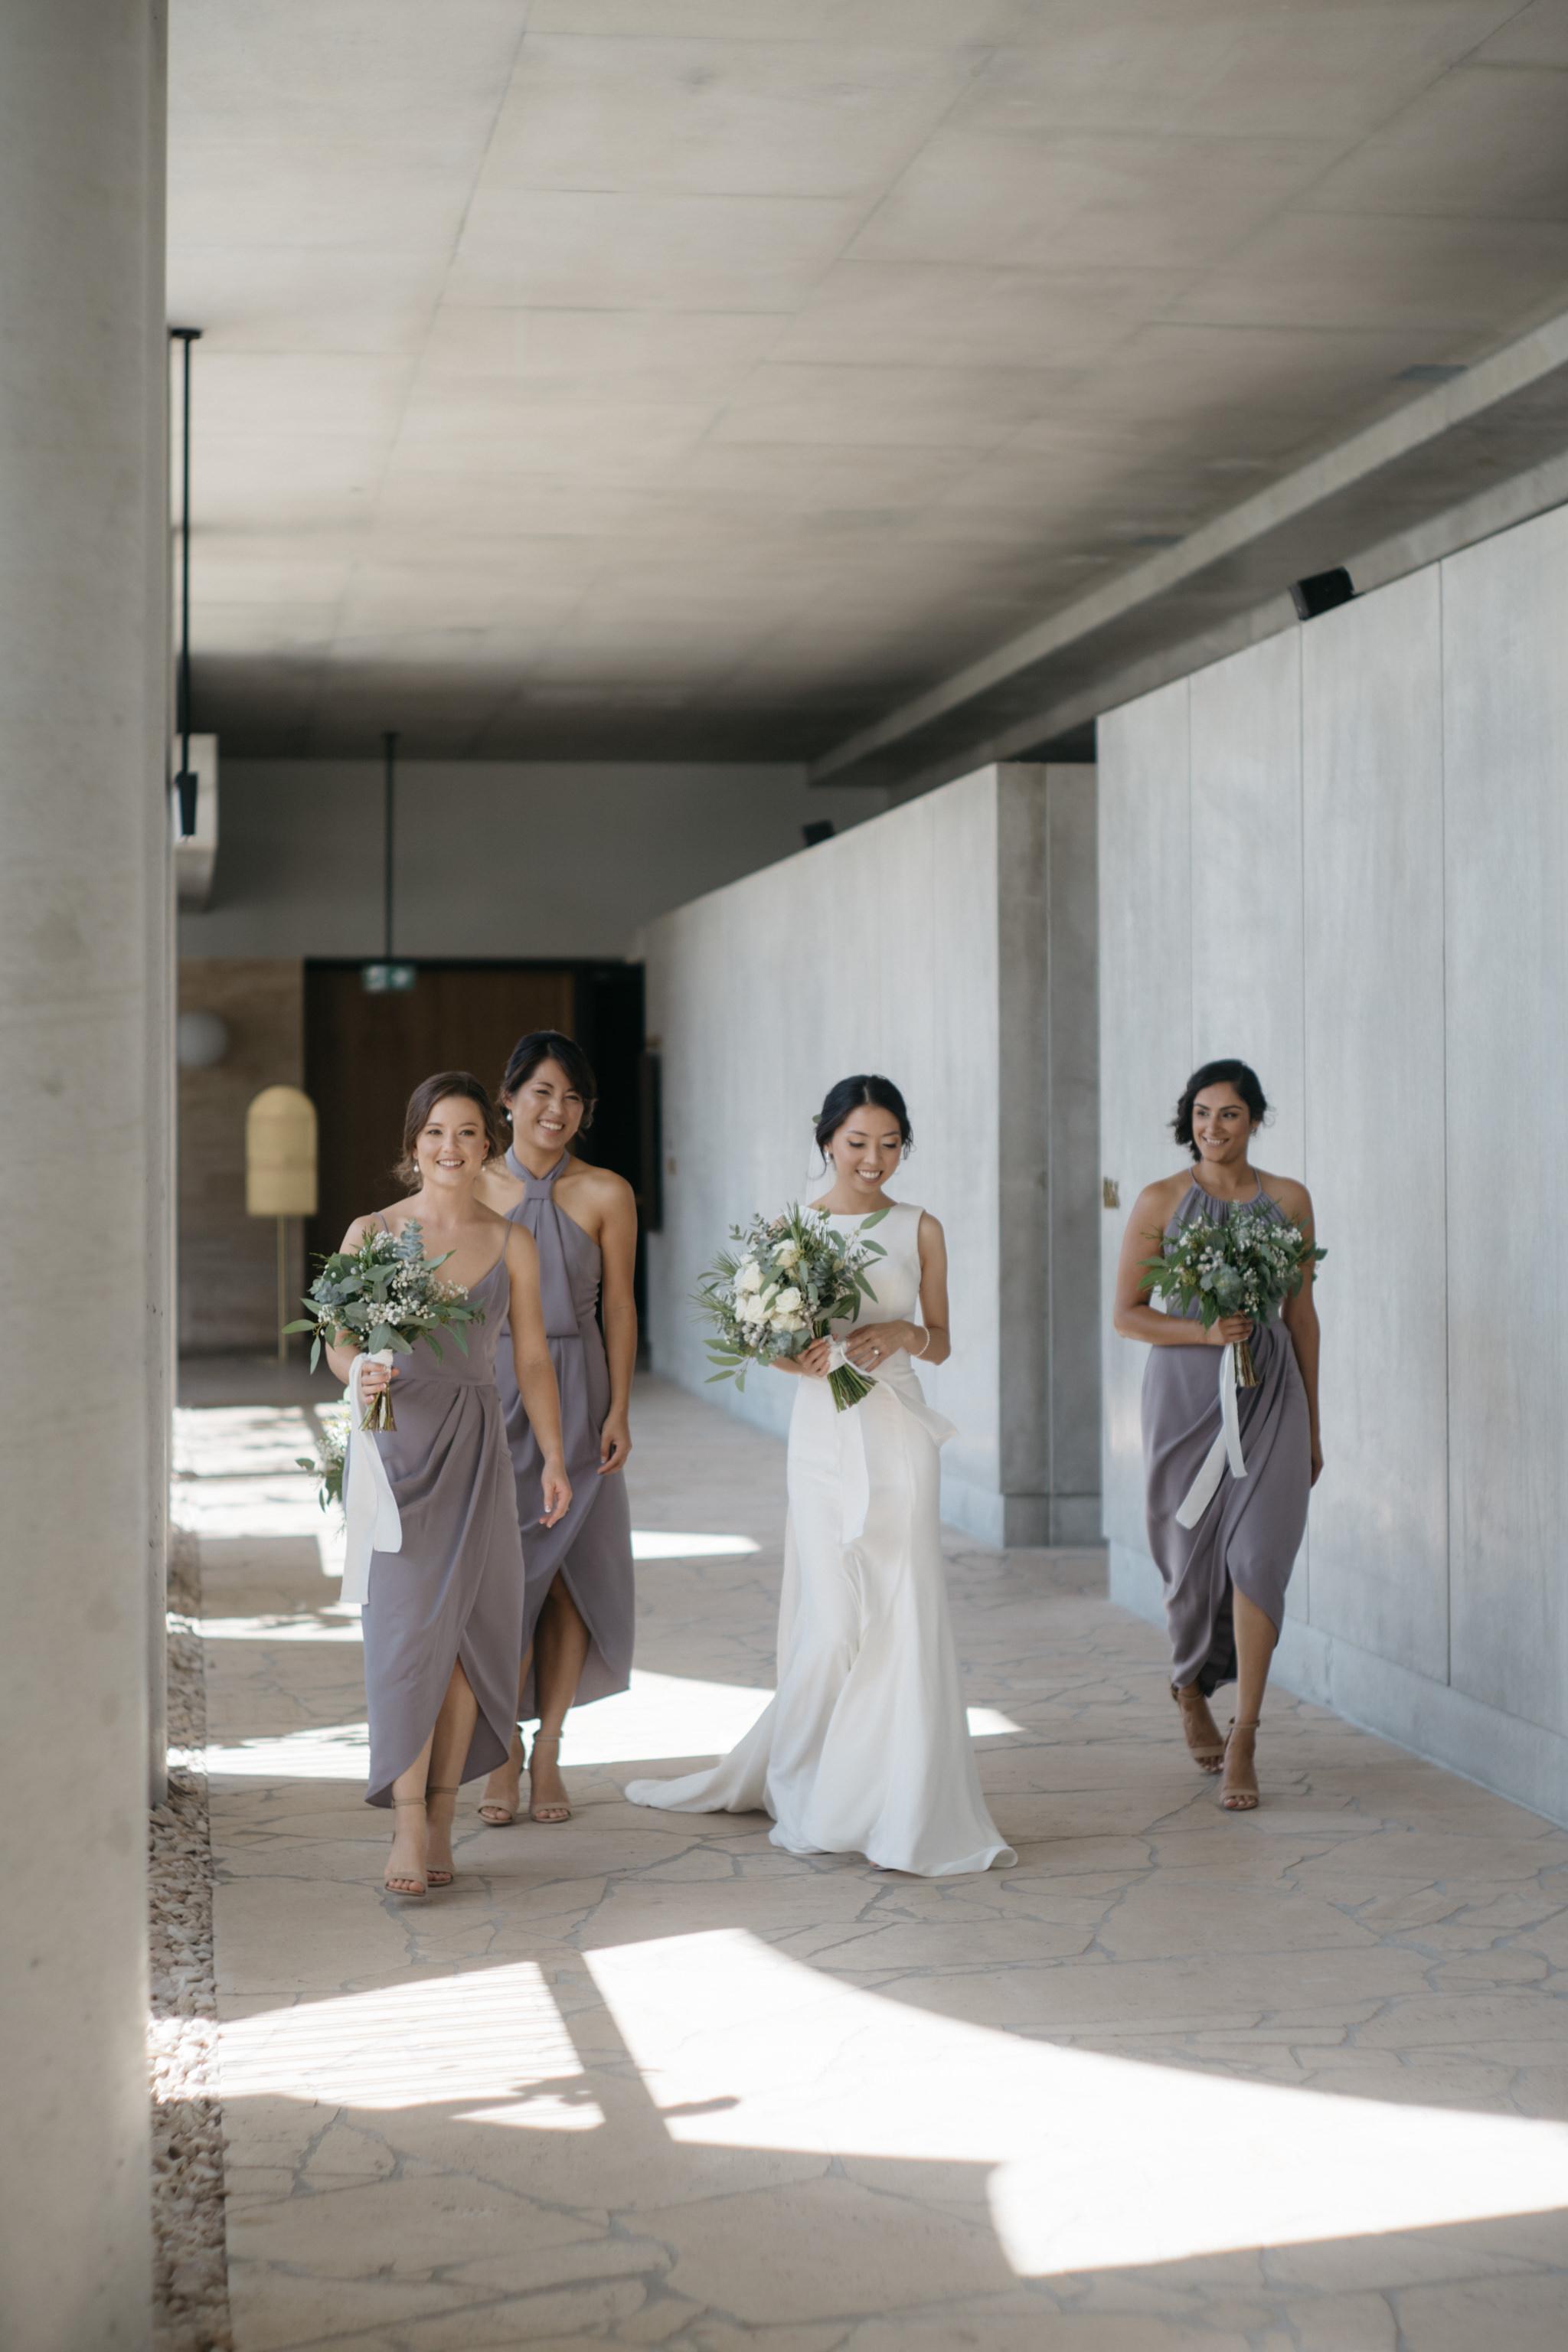 Bride and bridesmaids, The Calile Hotel, Brisbane Wedding, Ephemeral Creative